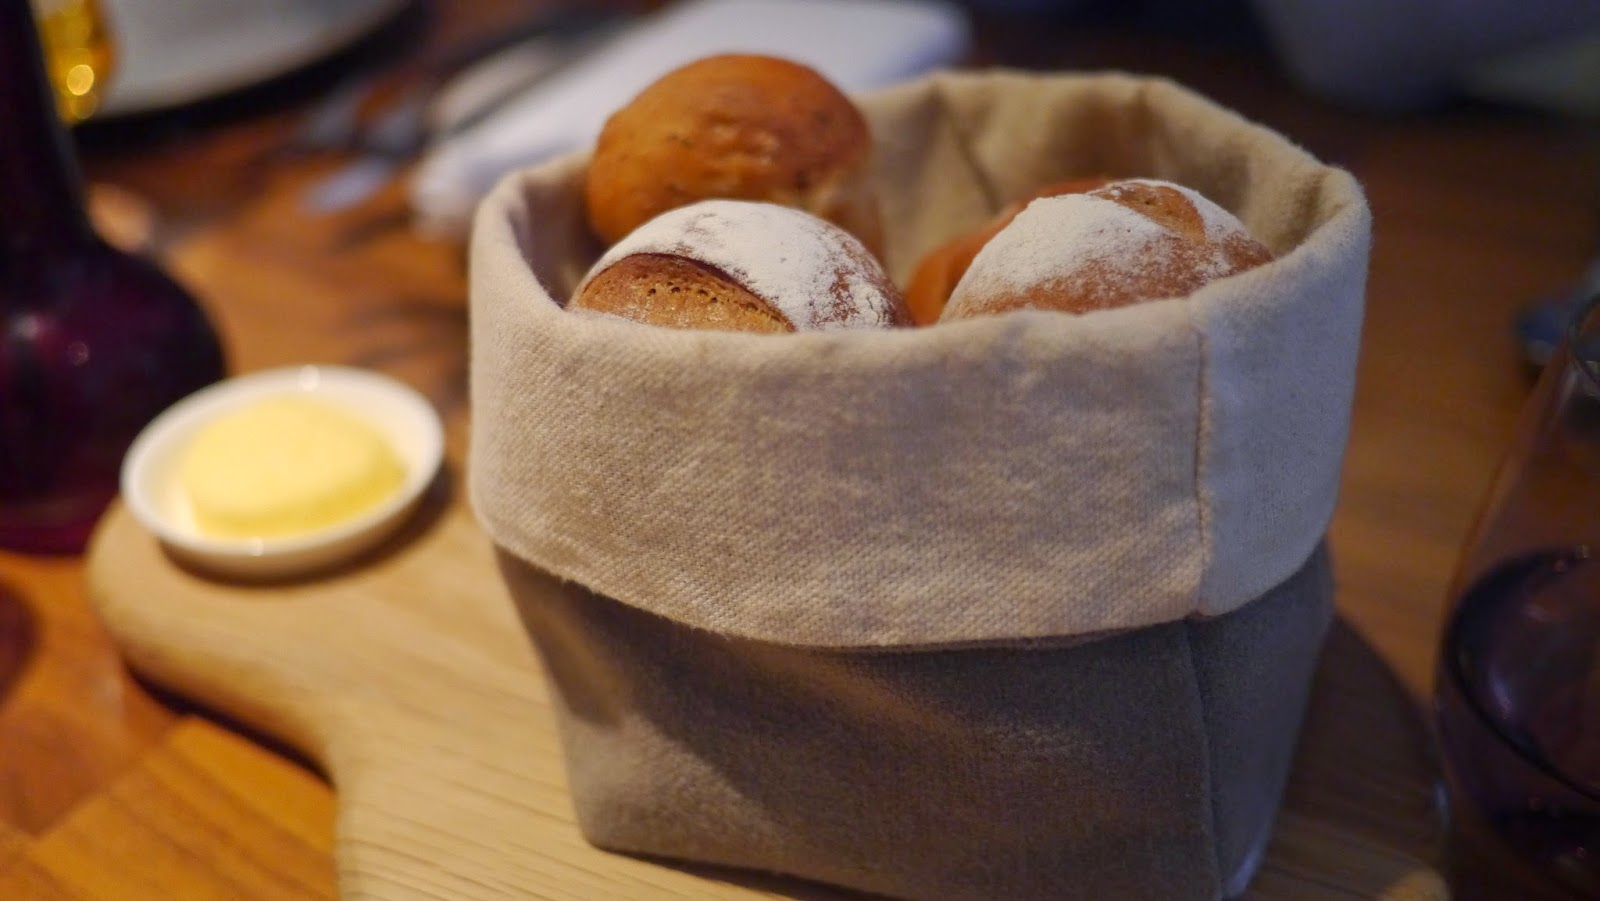 Bread Artichoke Old Amersham